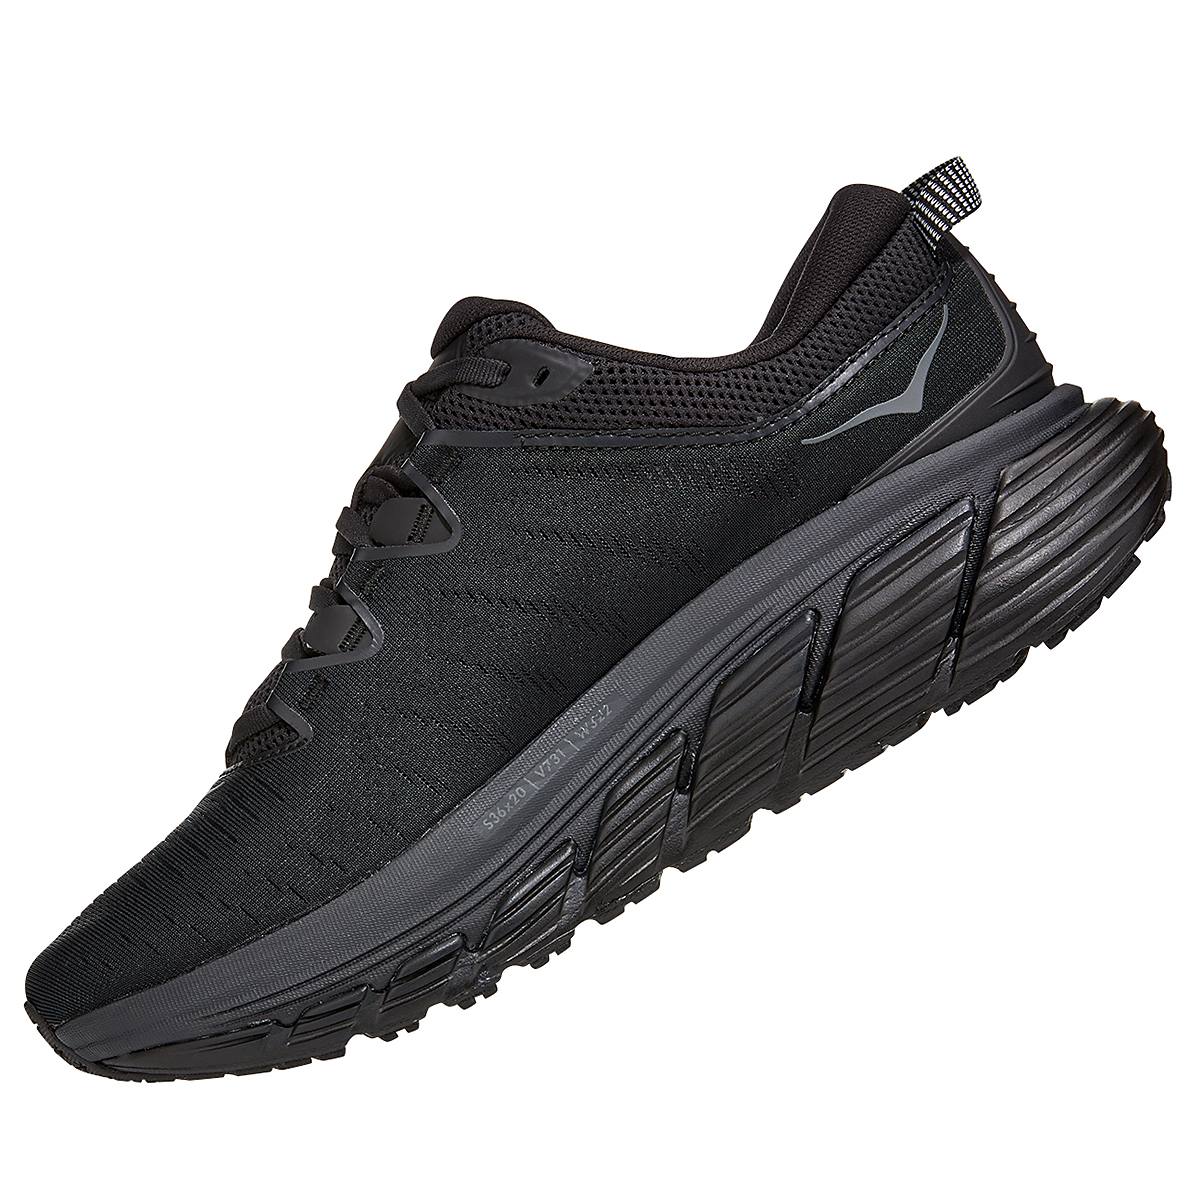 Men's Hoka One One Gaviota 3 Running Shoe - Color: Black/Black - Size: 7 - Width: Regular, Black/Black, large, image 2